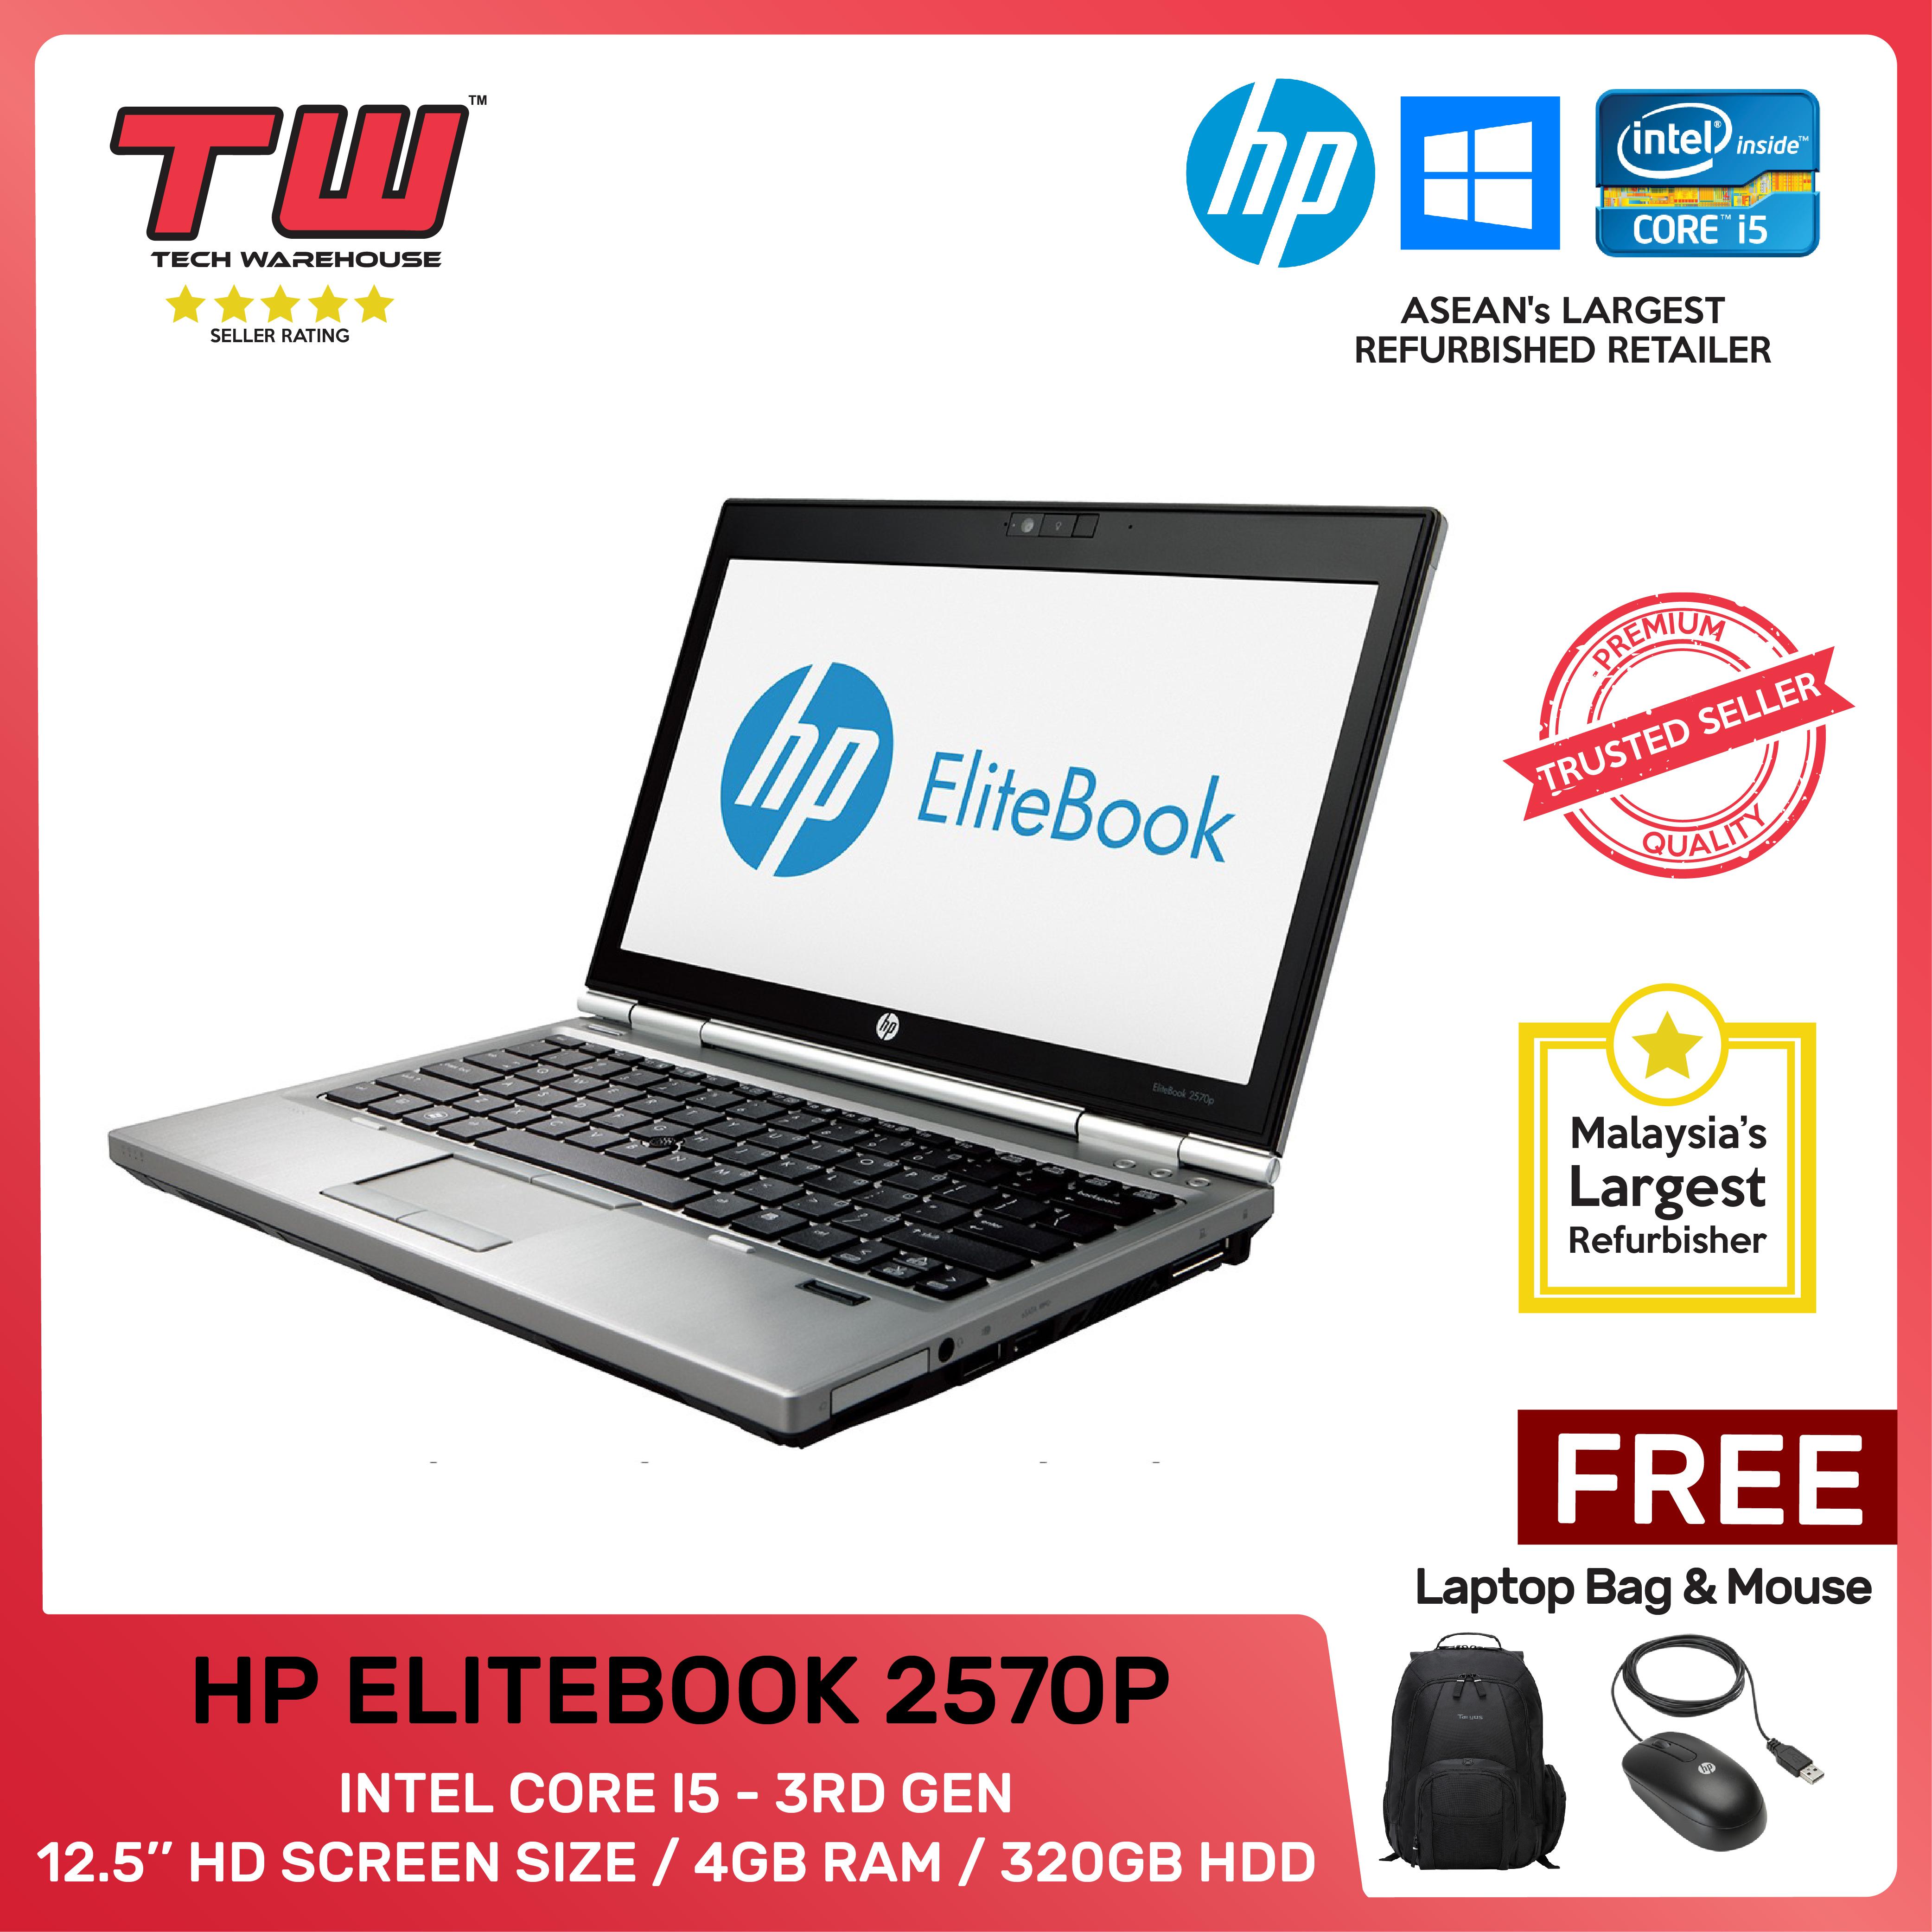 HP ELITEBOOK 2570p / INTEL CORE I5 3RD GEN / LAPTOP / 12.5/ 4GB RAM / 320GB HDD / TECH WAREHOUSE (FACTORY REFURBISHED) Malaysia